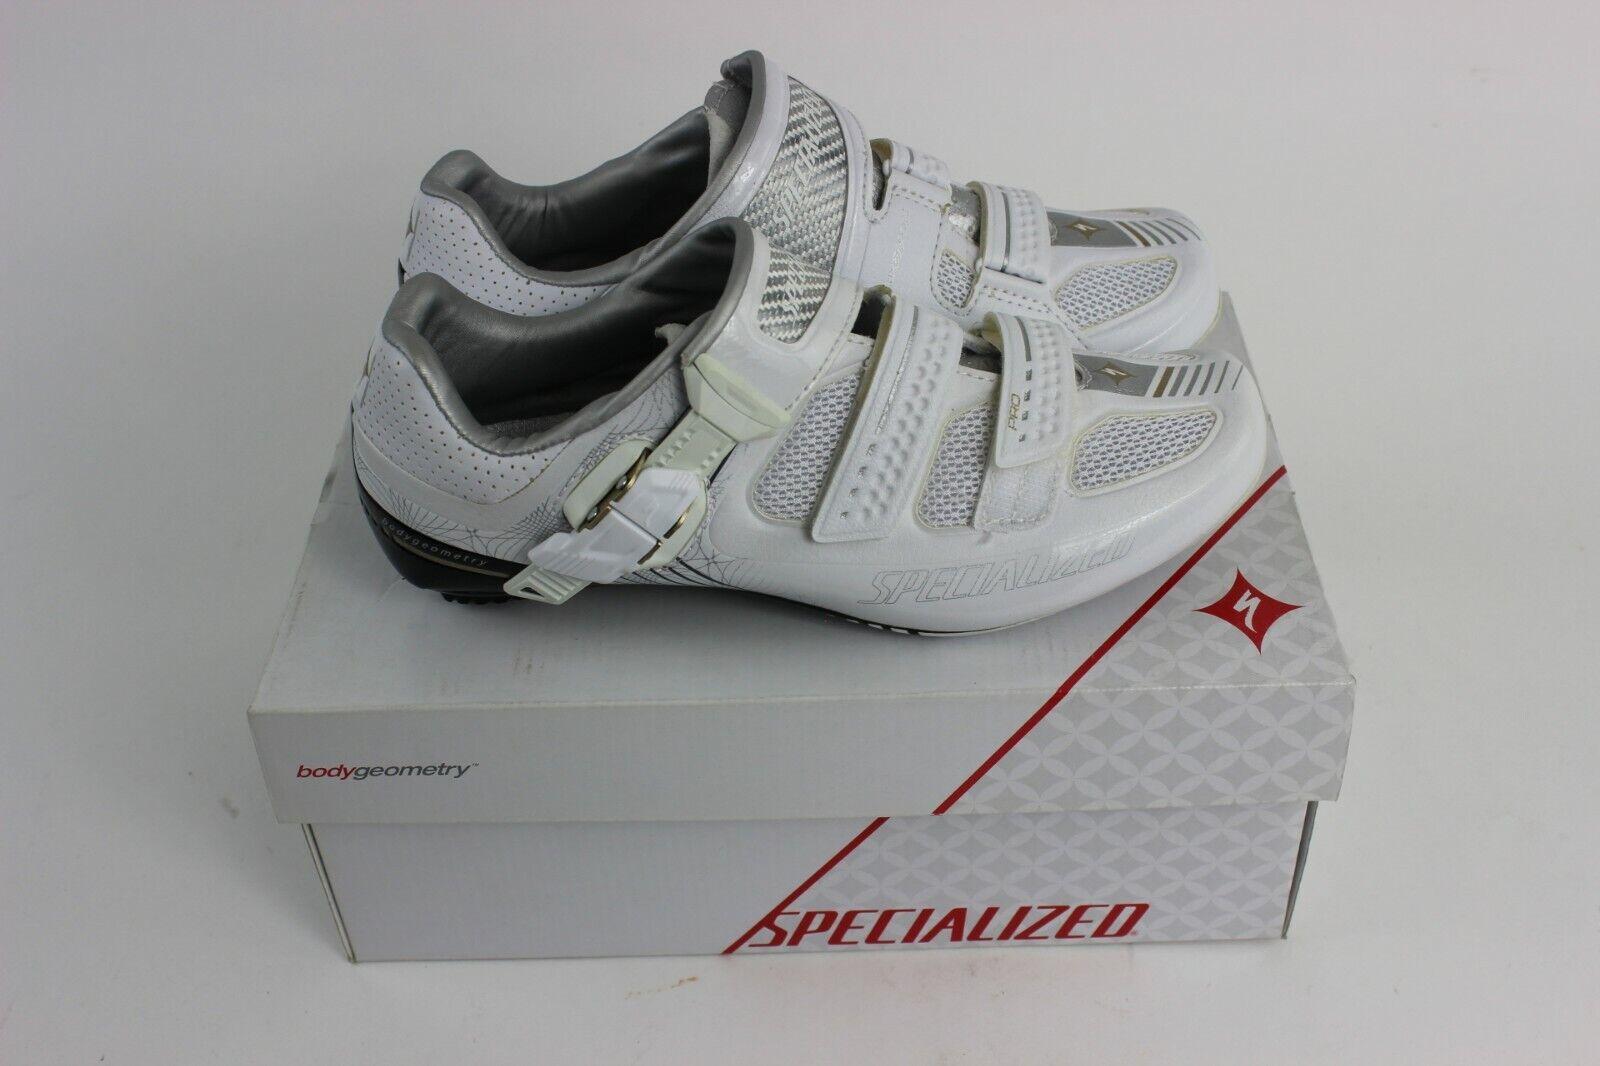 New Specialized Pro Road Women's Cycling shoesWhite, 38.5 EU   7.5 US